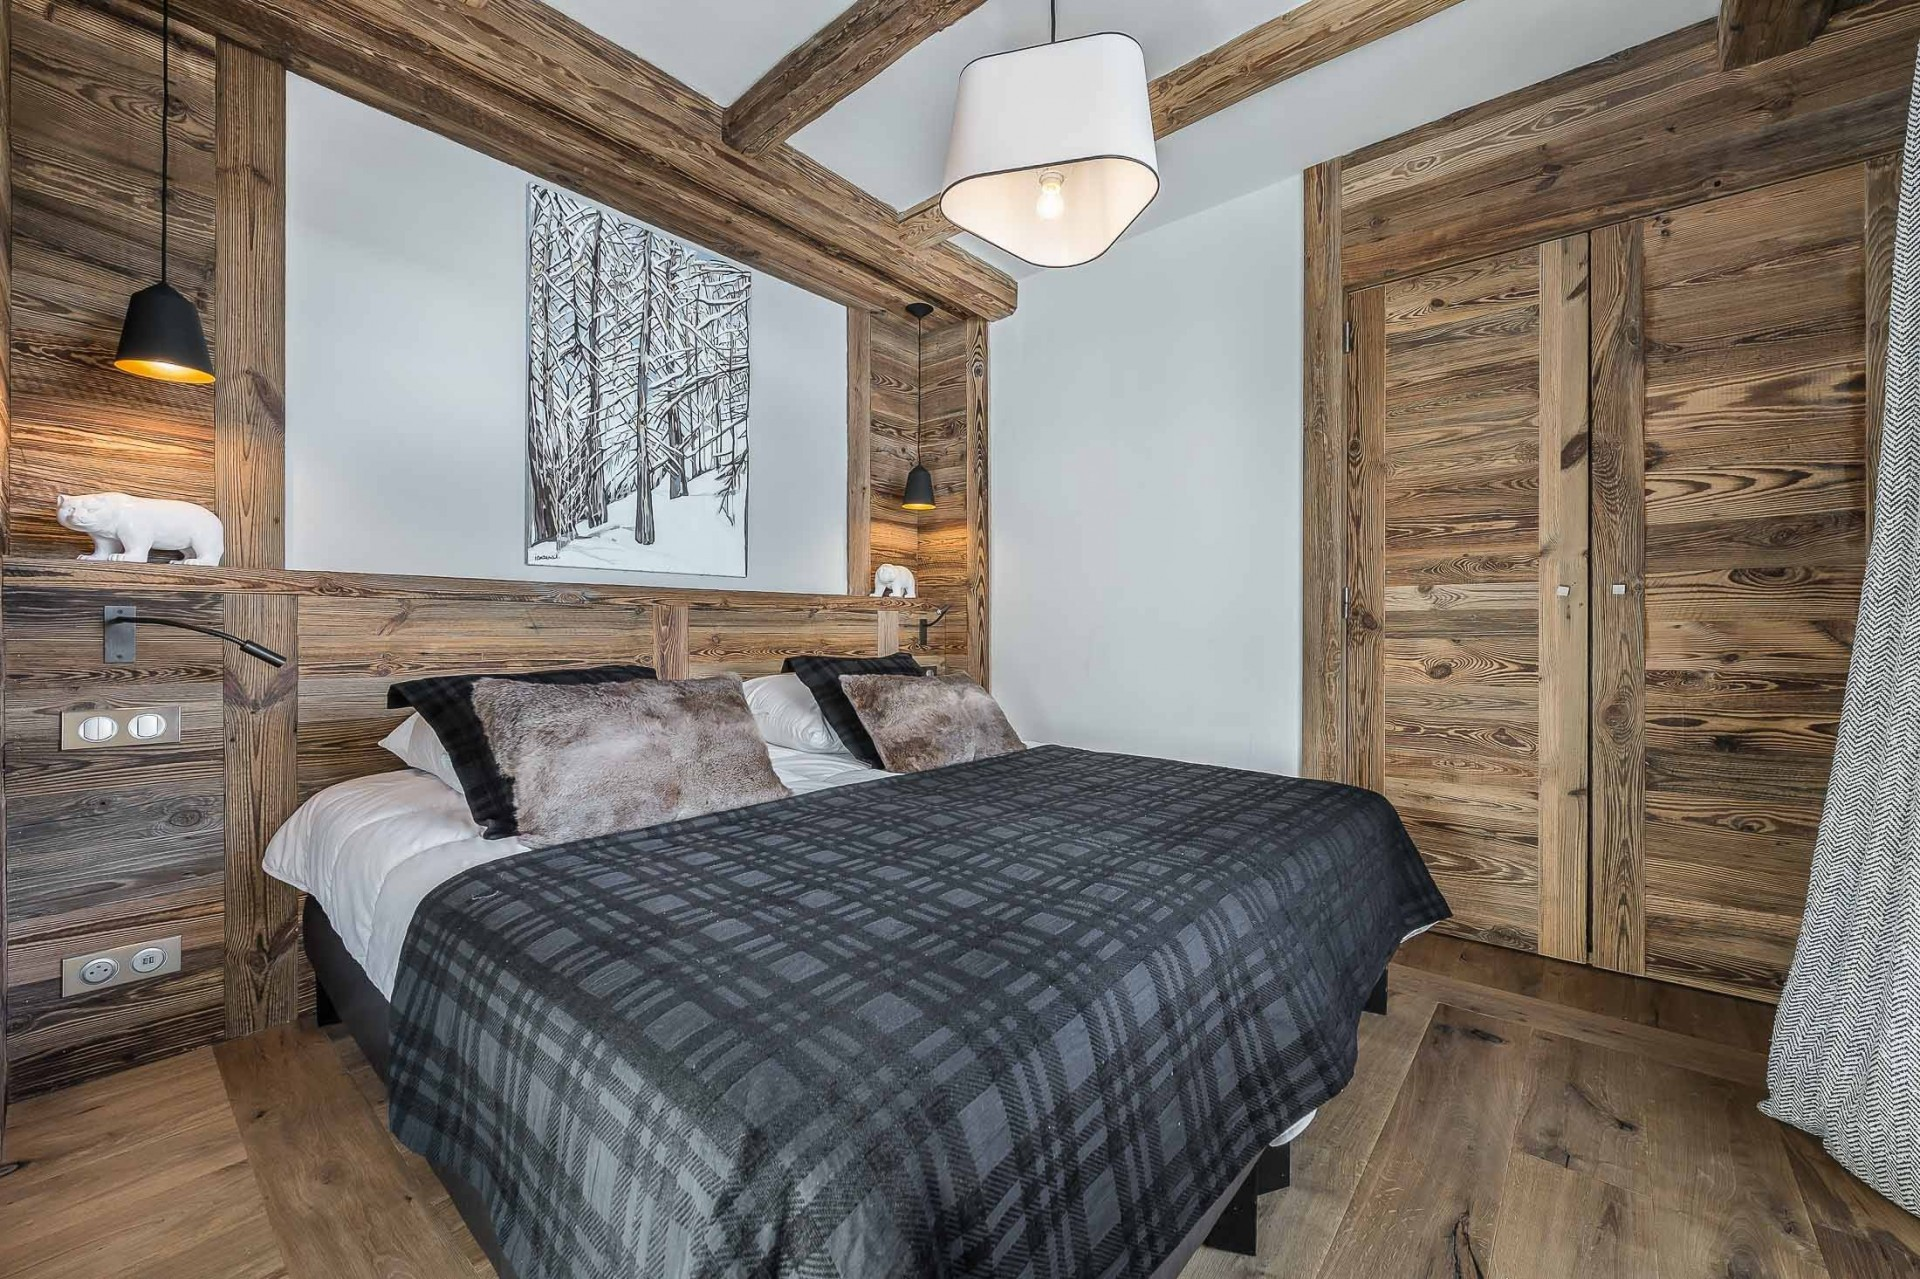 Val d'Isère Location Appartement Luxe Ucelite Chambre 4